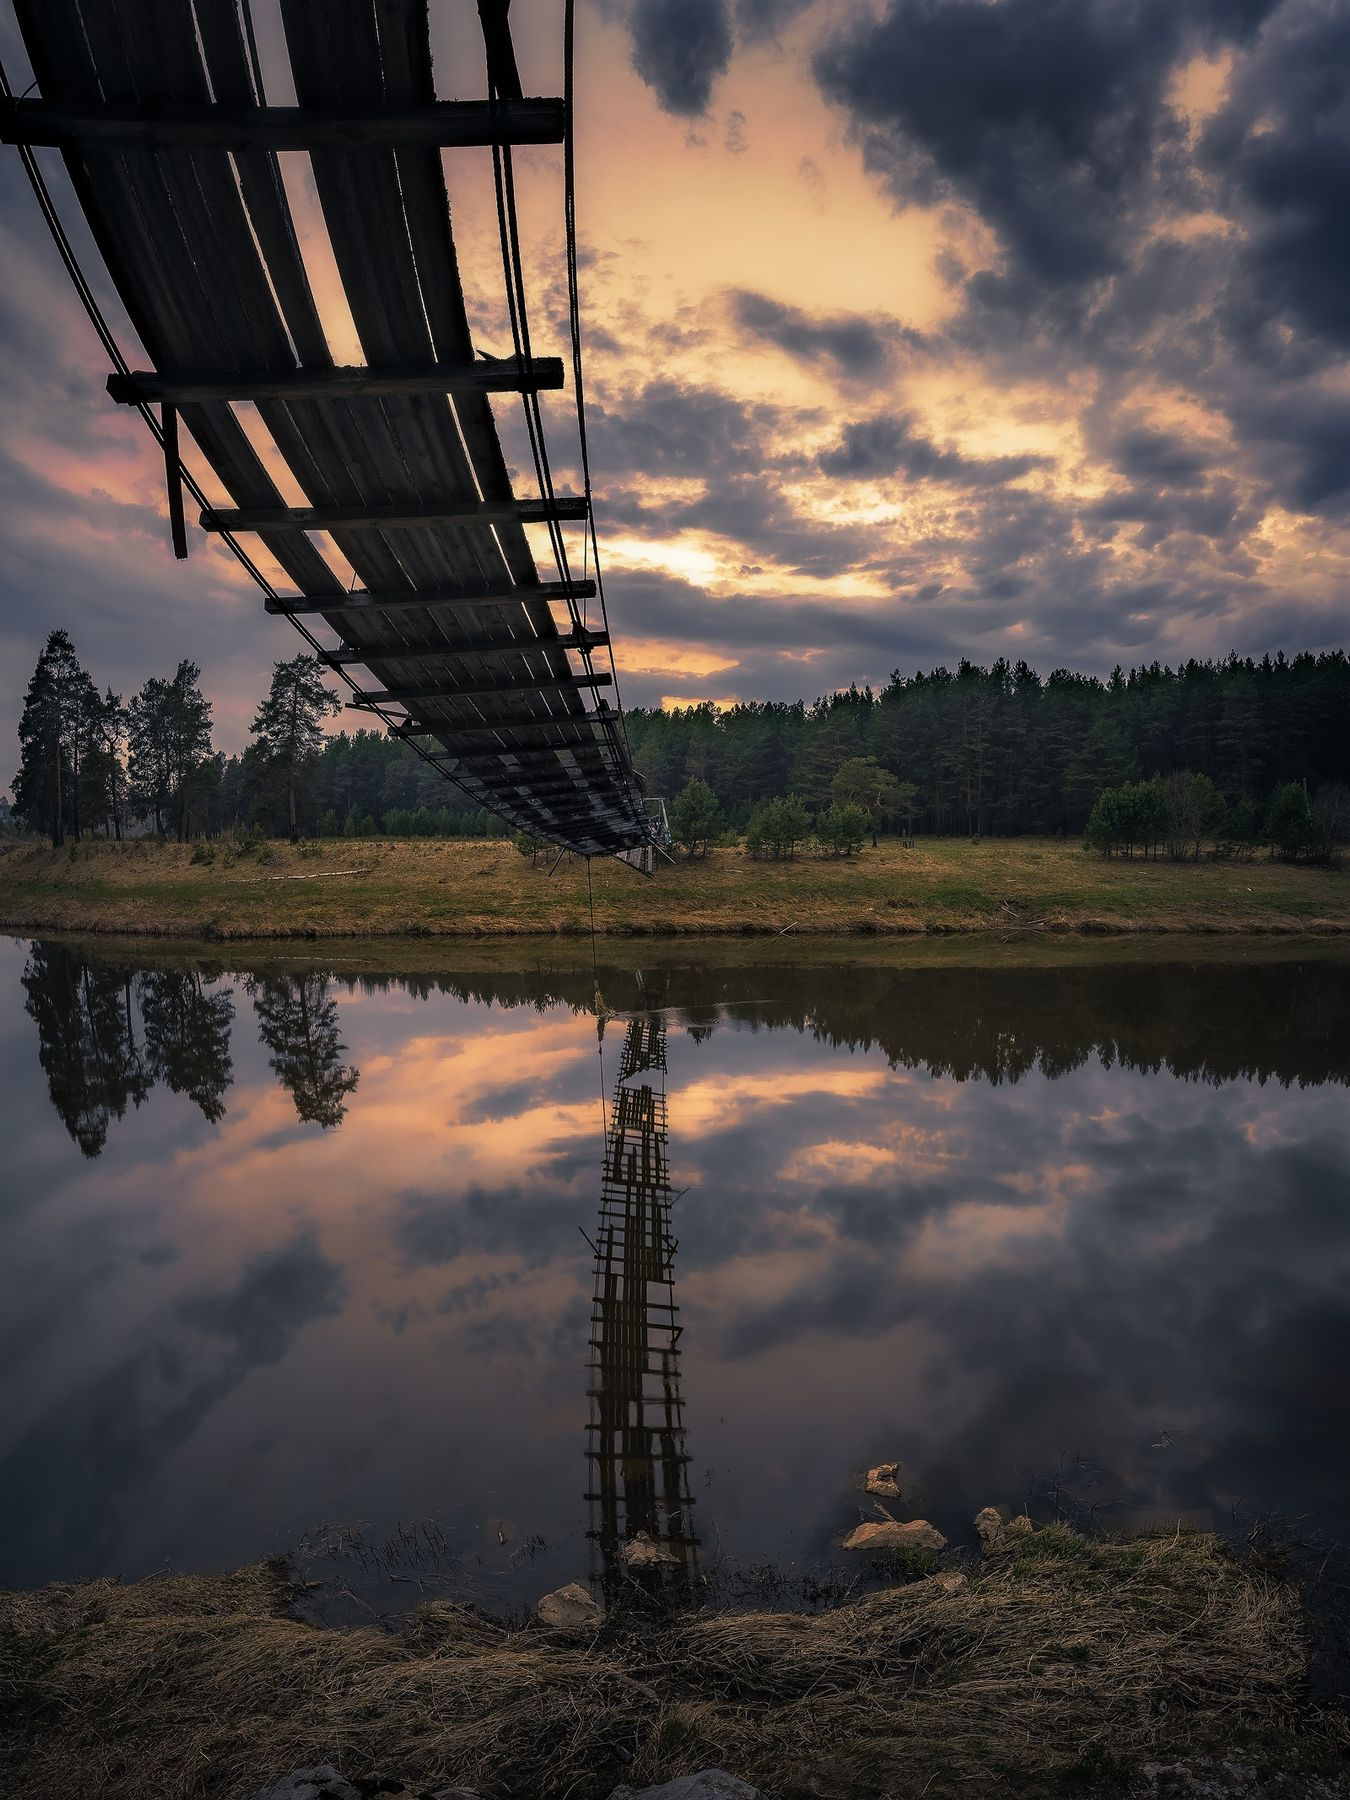 Старый мост мост река закат вечер нейва урал вода отражение облака весна